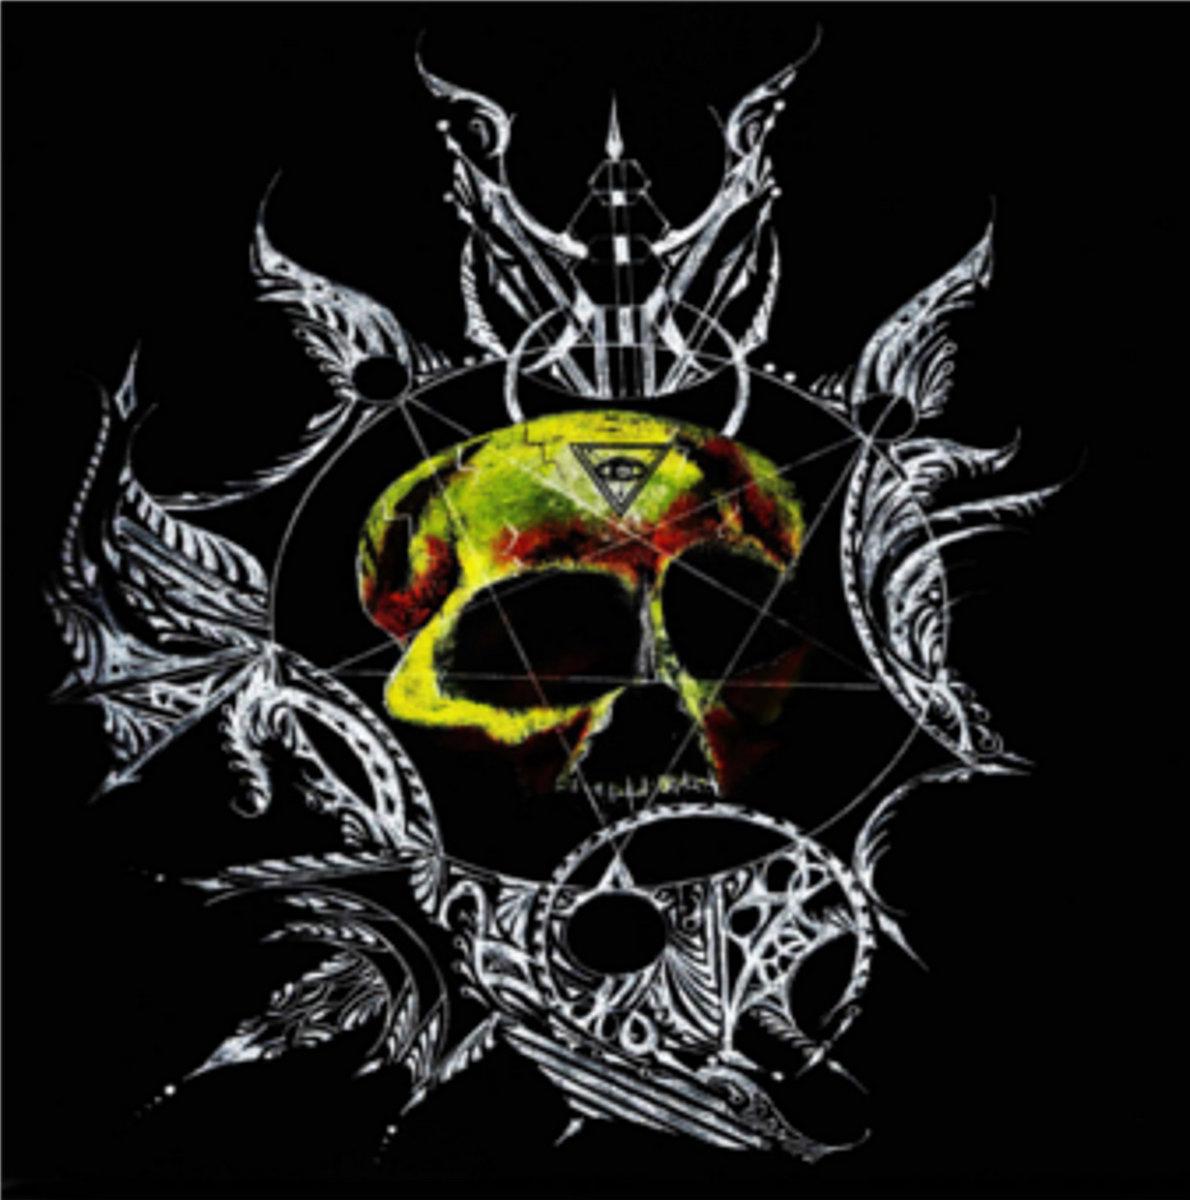 Free download metal compilation mp3 metal venom promotions youtube.